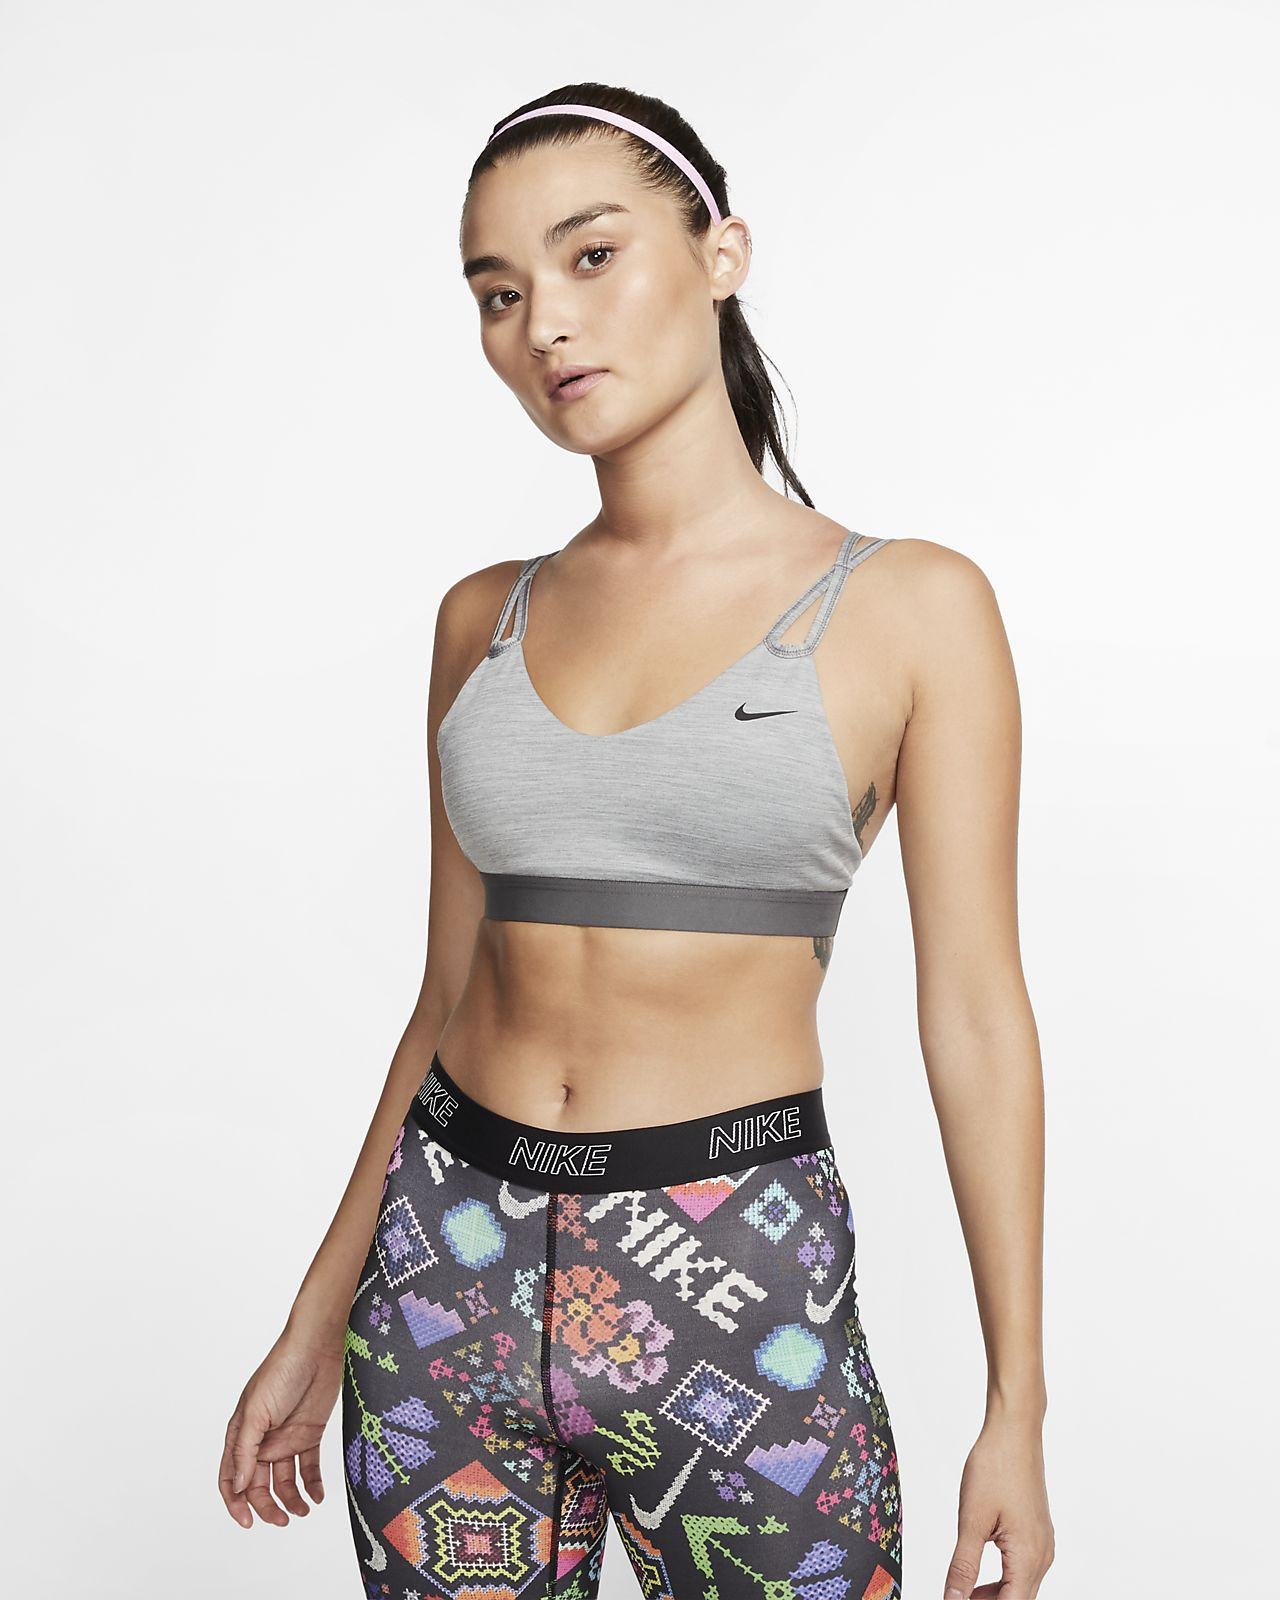 Nike Yoga Women's Light-Support Sports Bra